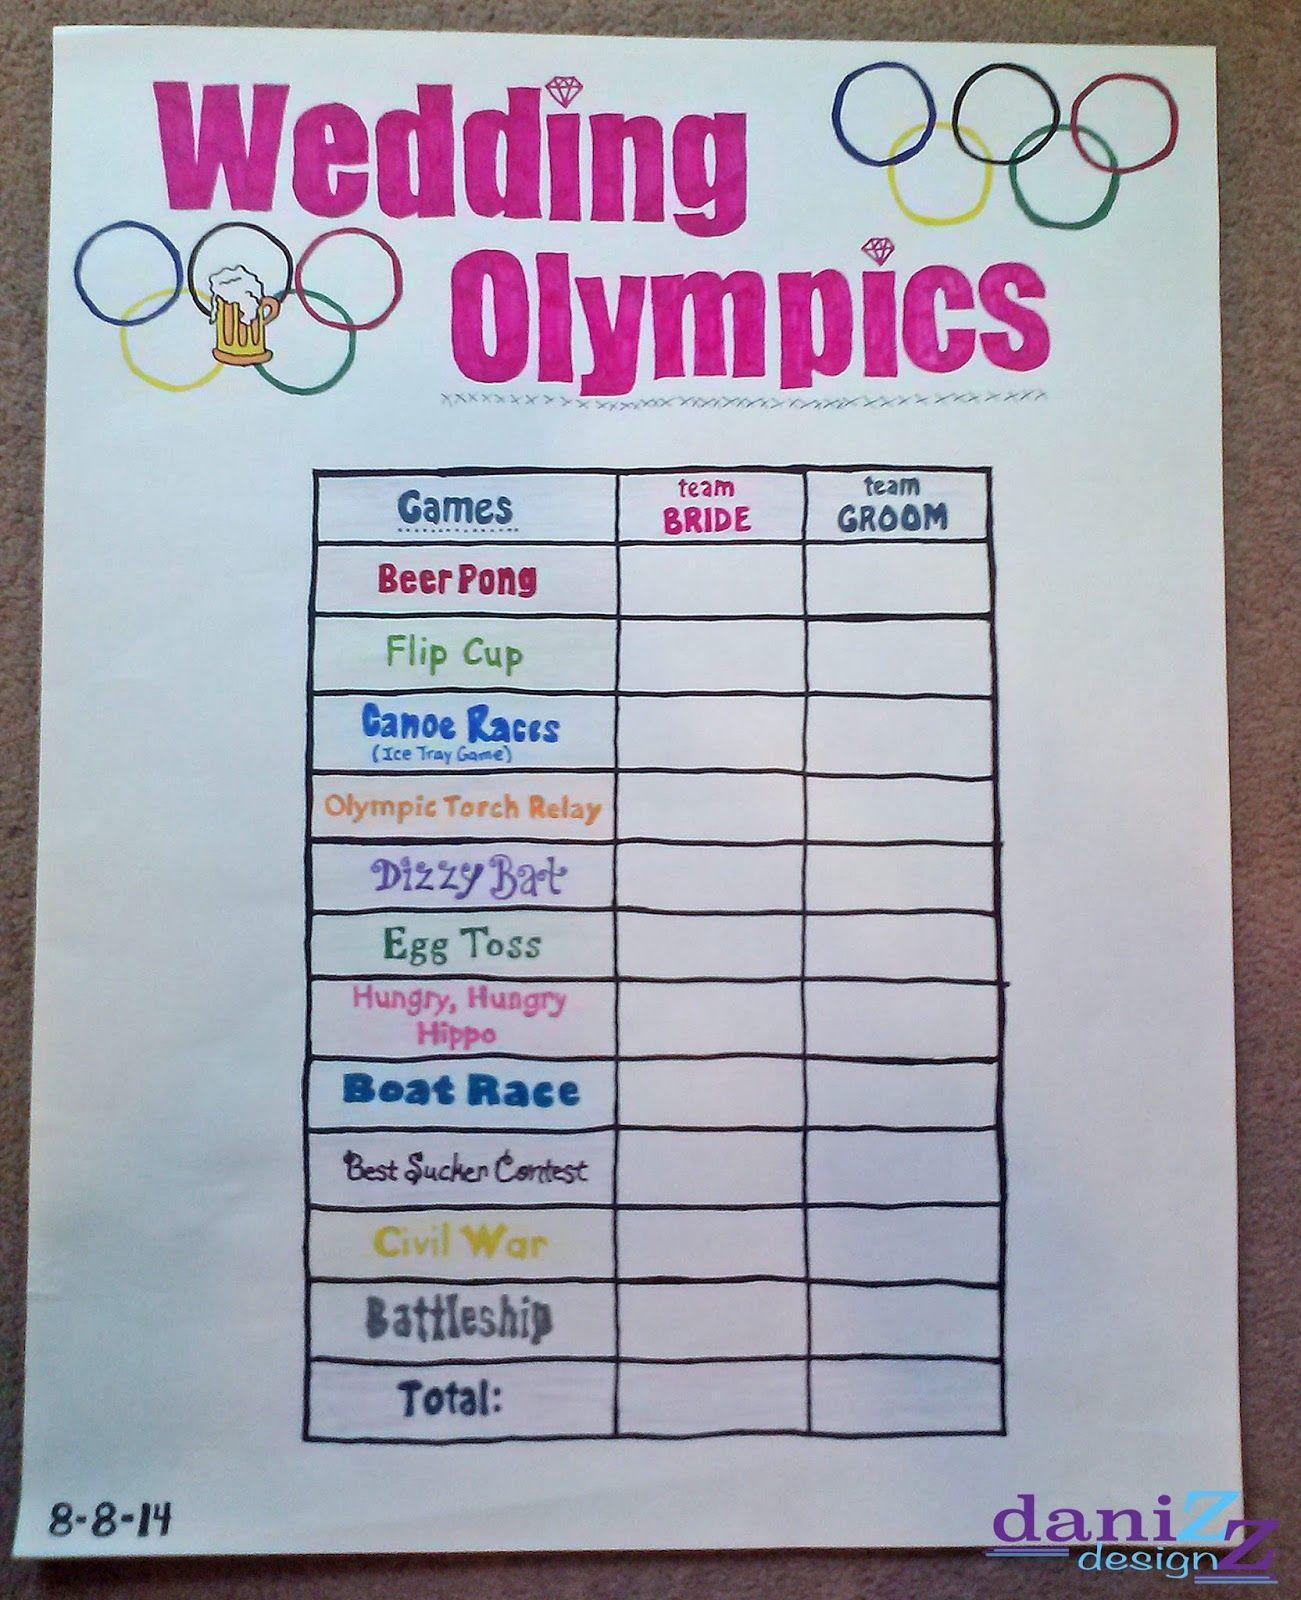 introducing e bridal party bridal parties weddings and wedding